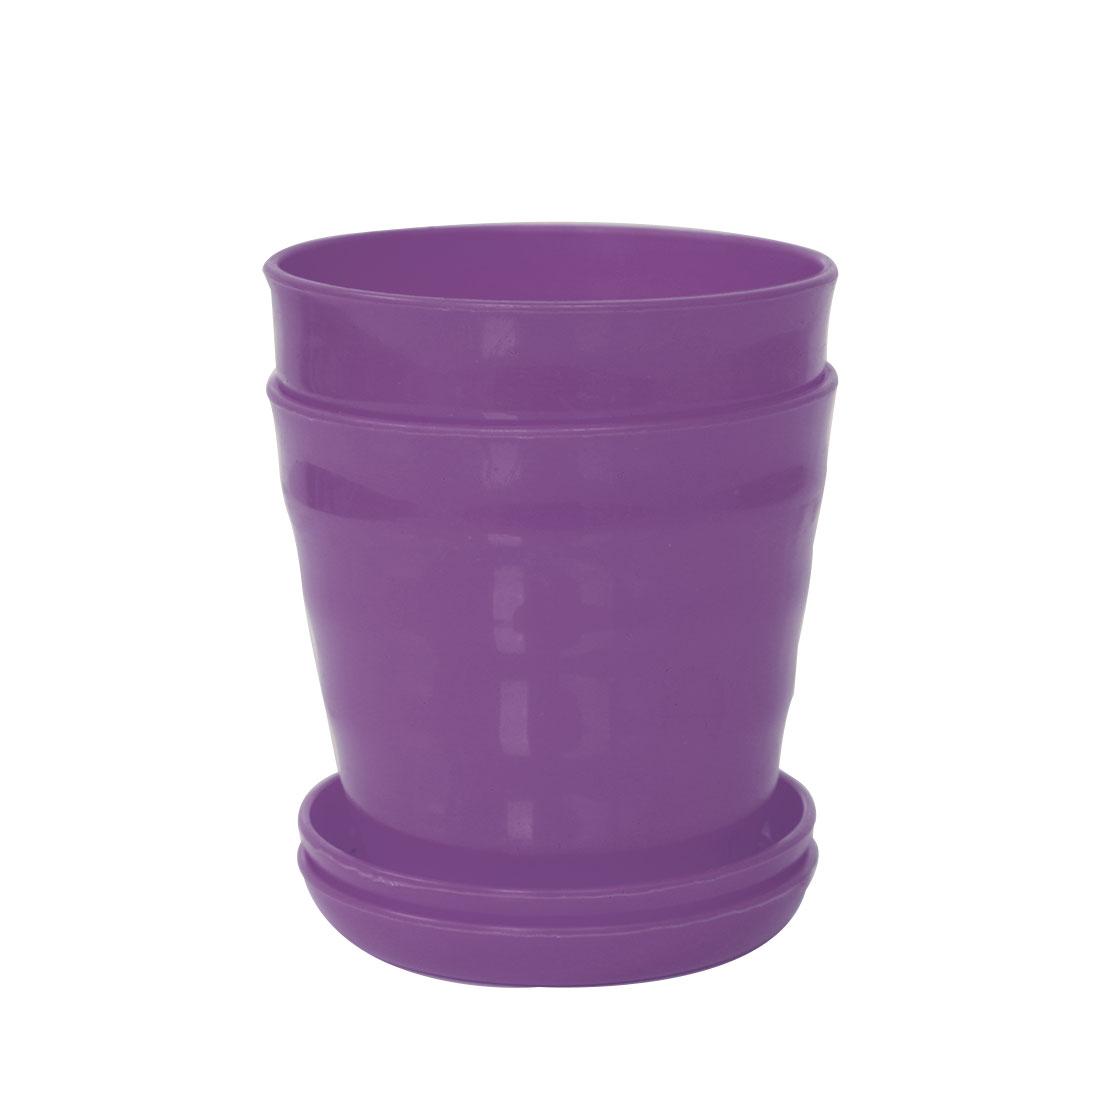 Apartment Desktop Plastic Round Cactus Plant Flower Seed Pot Tray Holder Light Purple 2pcs